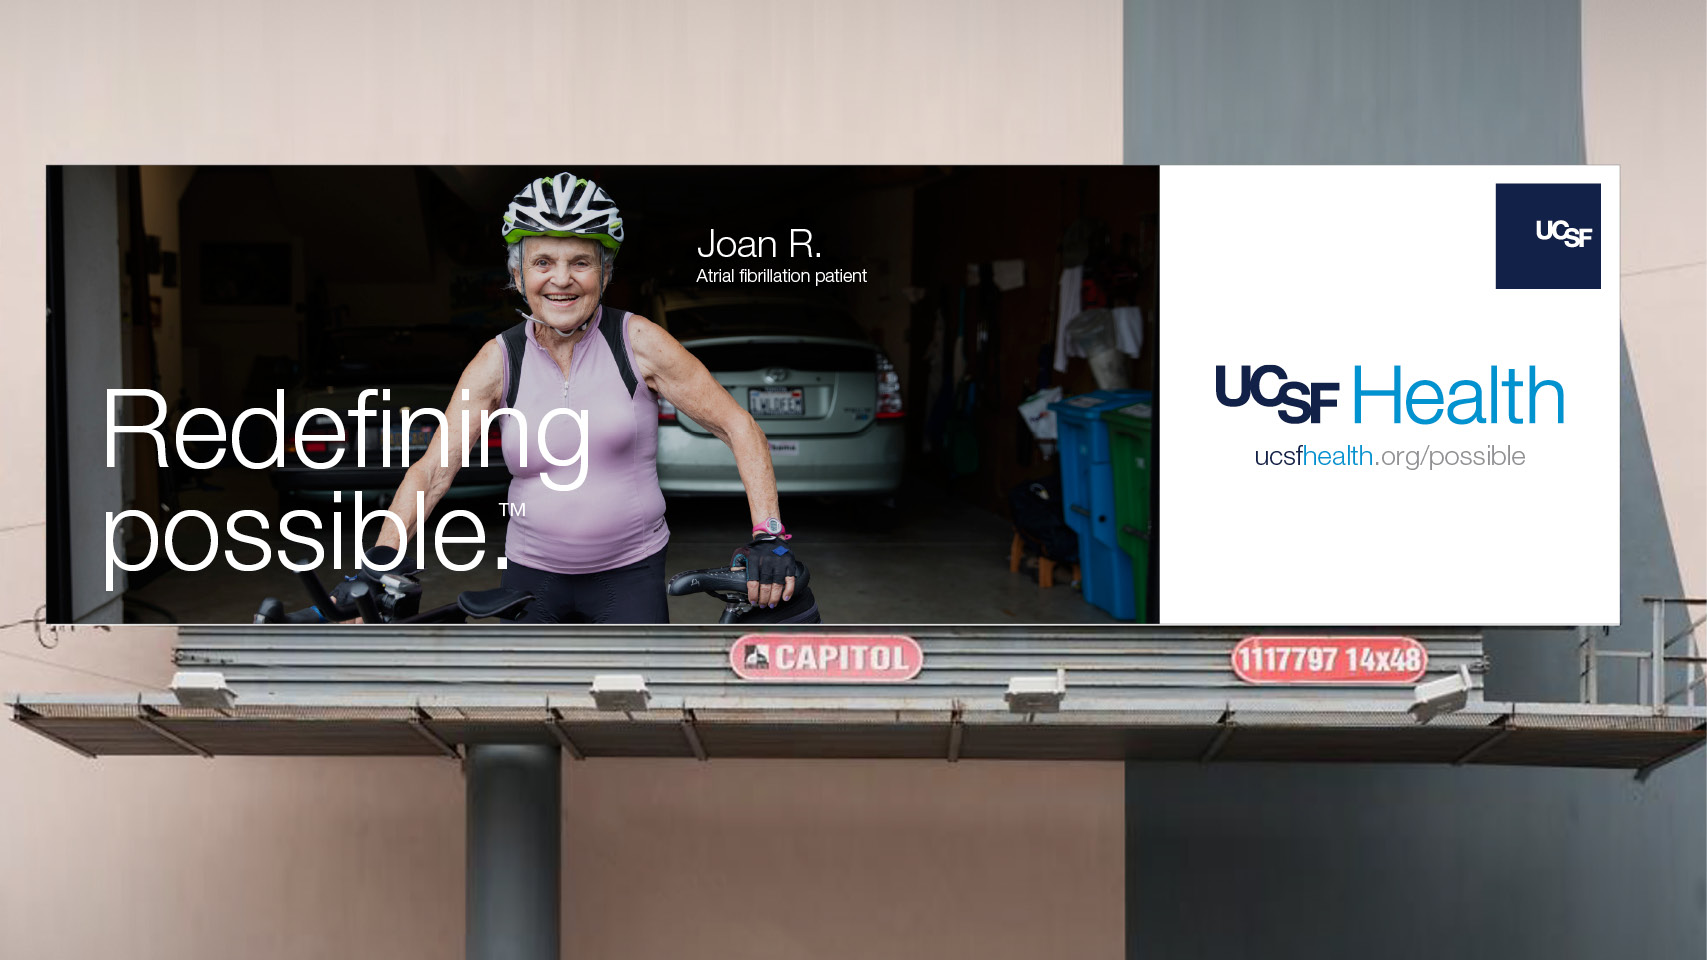 ucsf-billboard-2.jpg